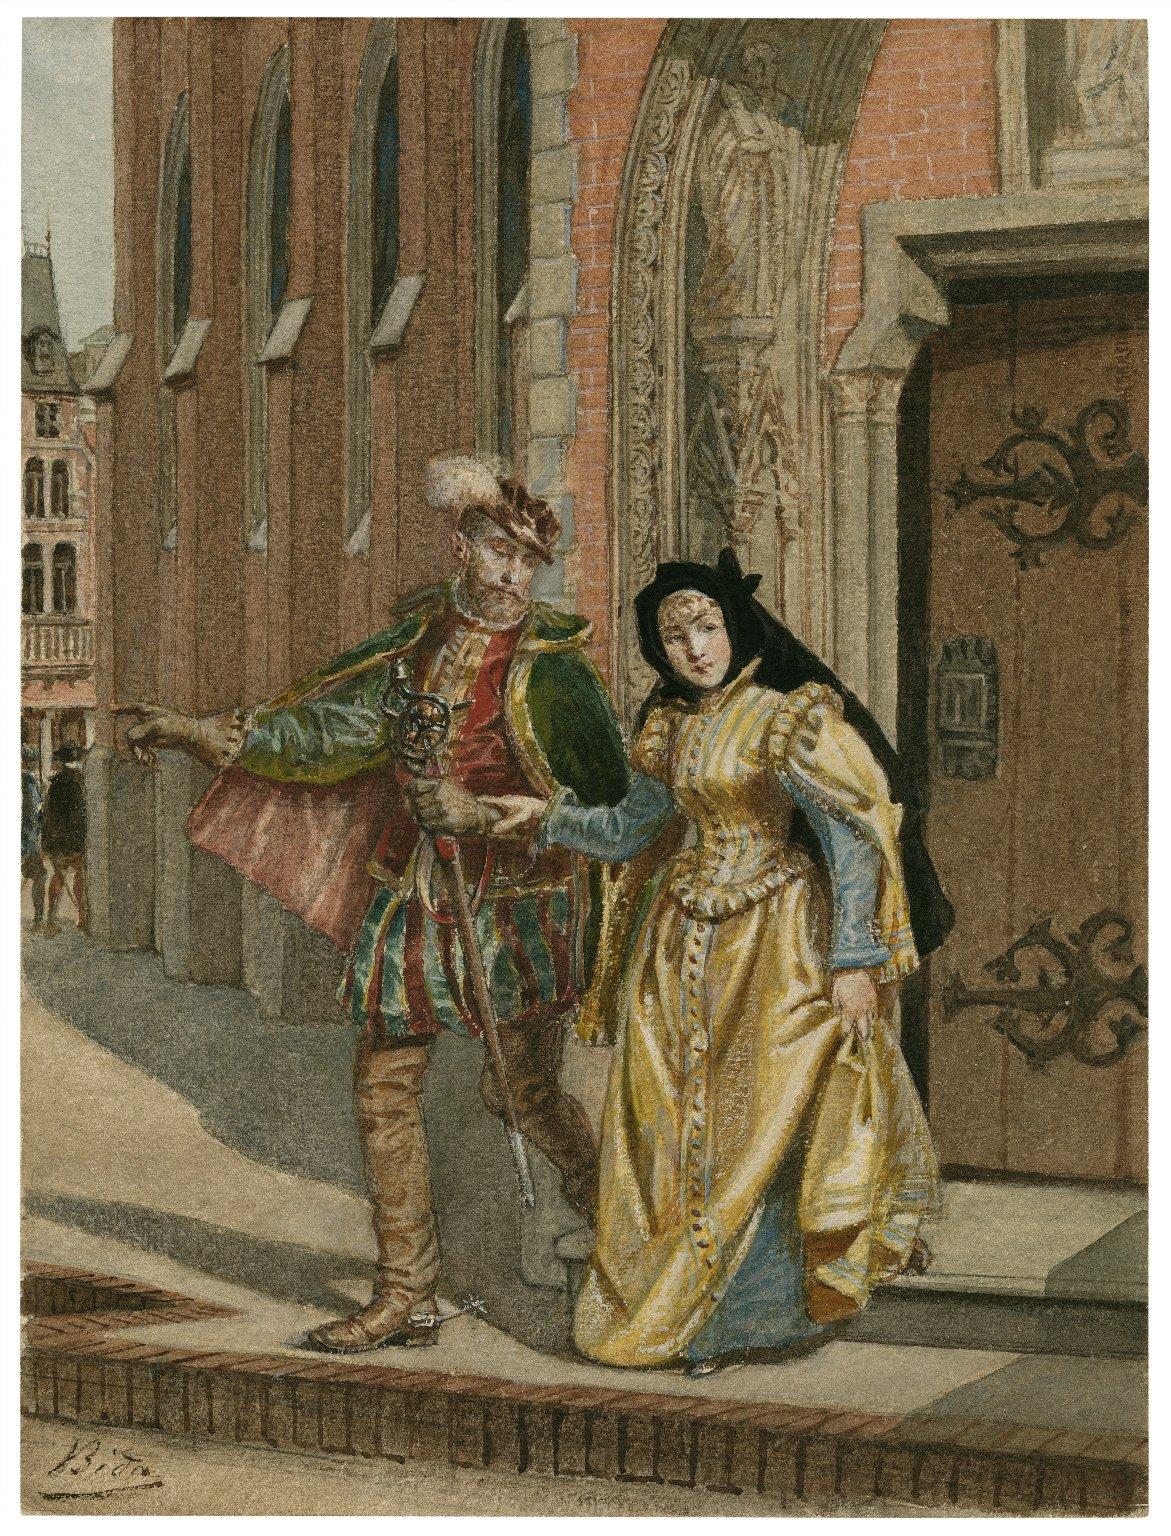 [Two gentlemen of Verona, V, 1, Eglamour and Silvia leave the abbey] [graphic] / [Alexandre Bida].